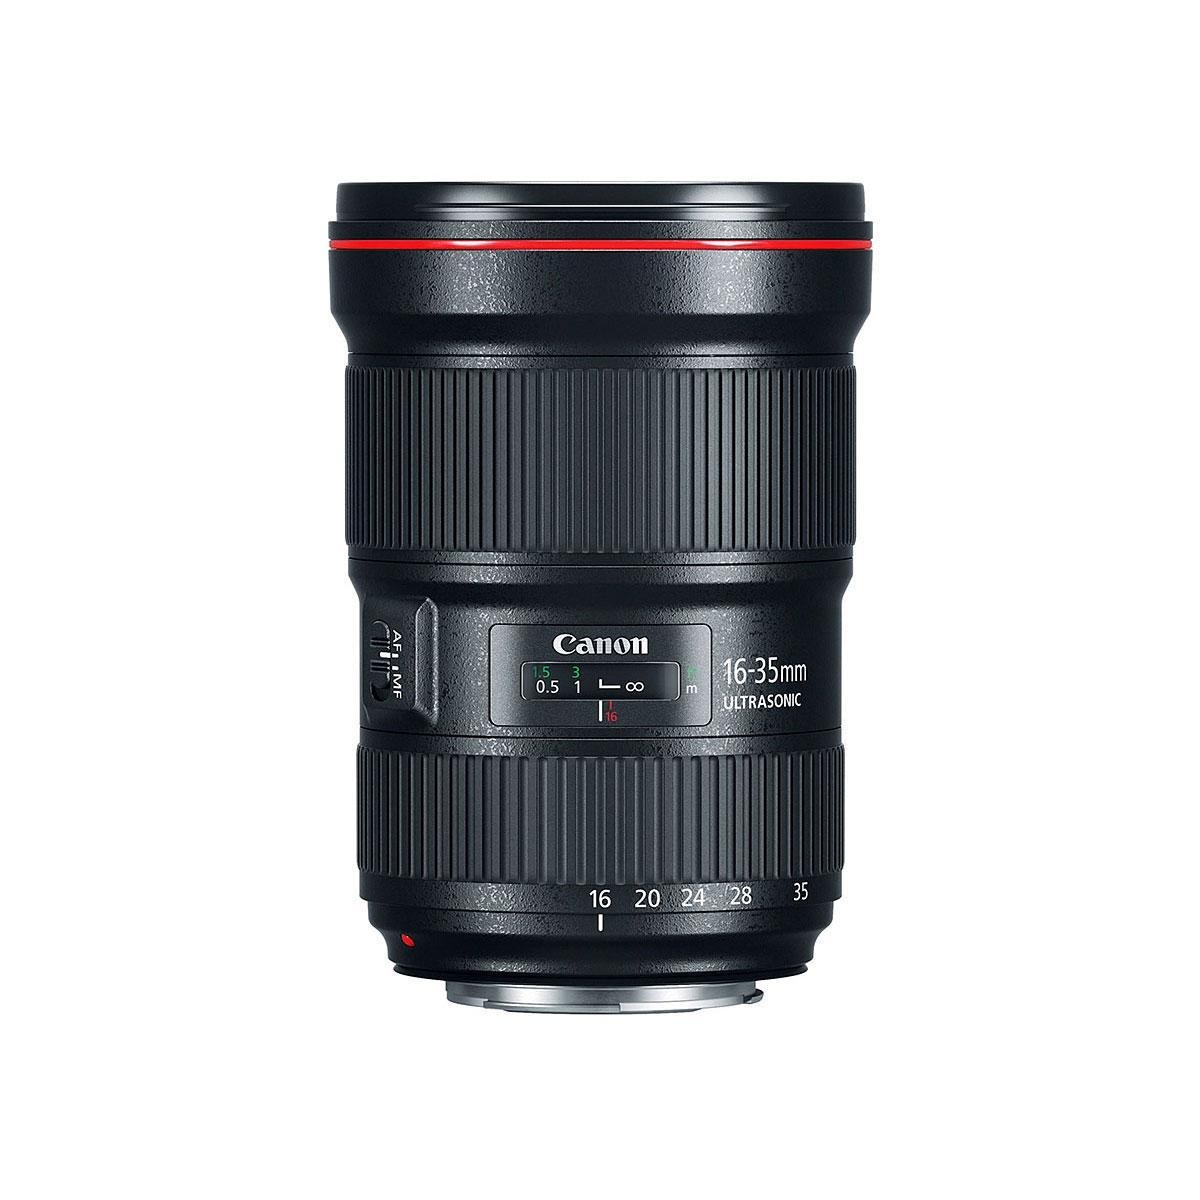 Canon EF 16-35mm f/2.8 L III USM | Foto Monza